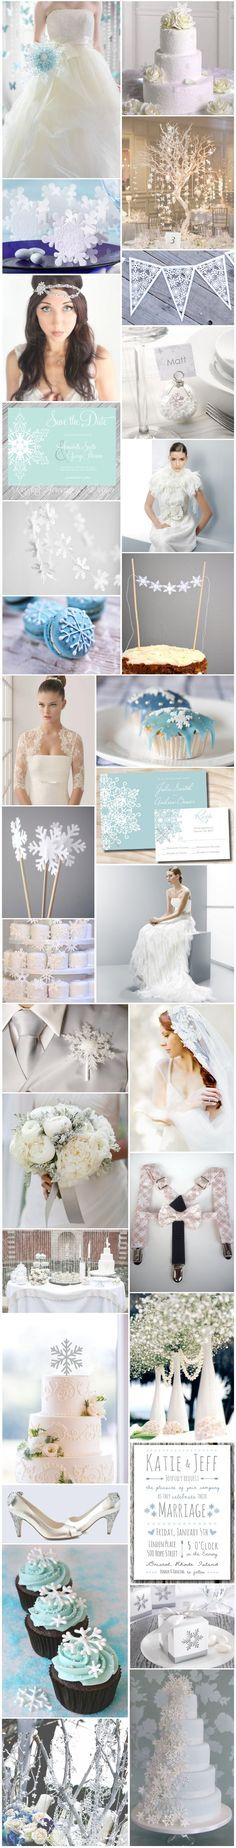 [Inspiration] Mariage flocon de neige